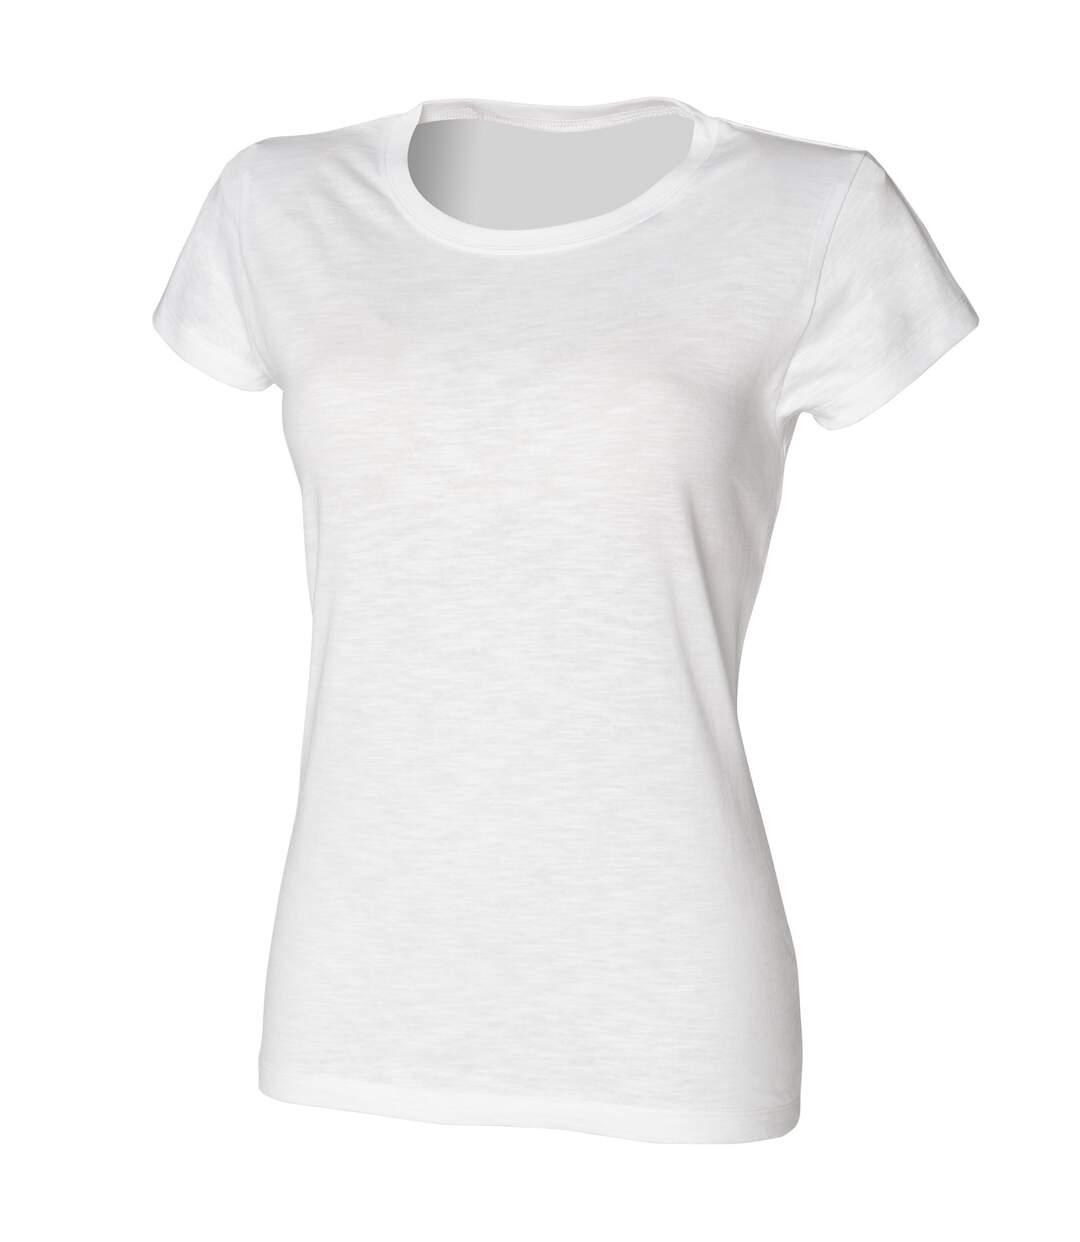 Skinni Fit - T-Shirt Long - Femme (Blanc) - UTRW1377